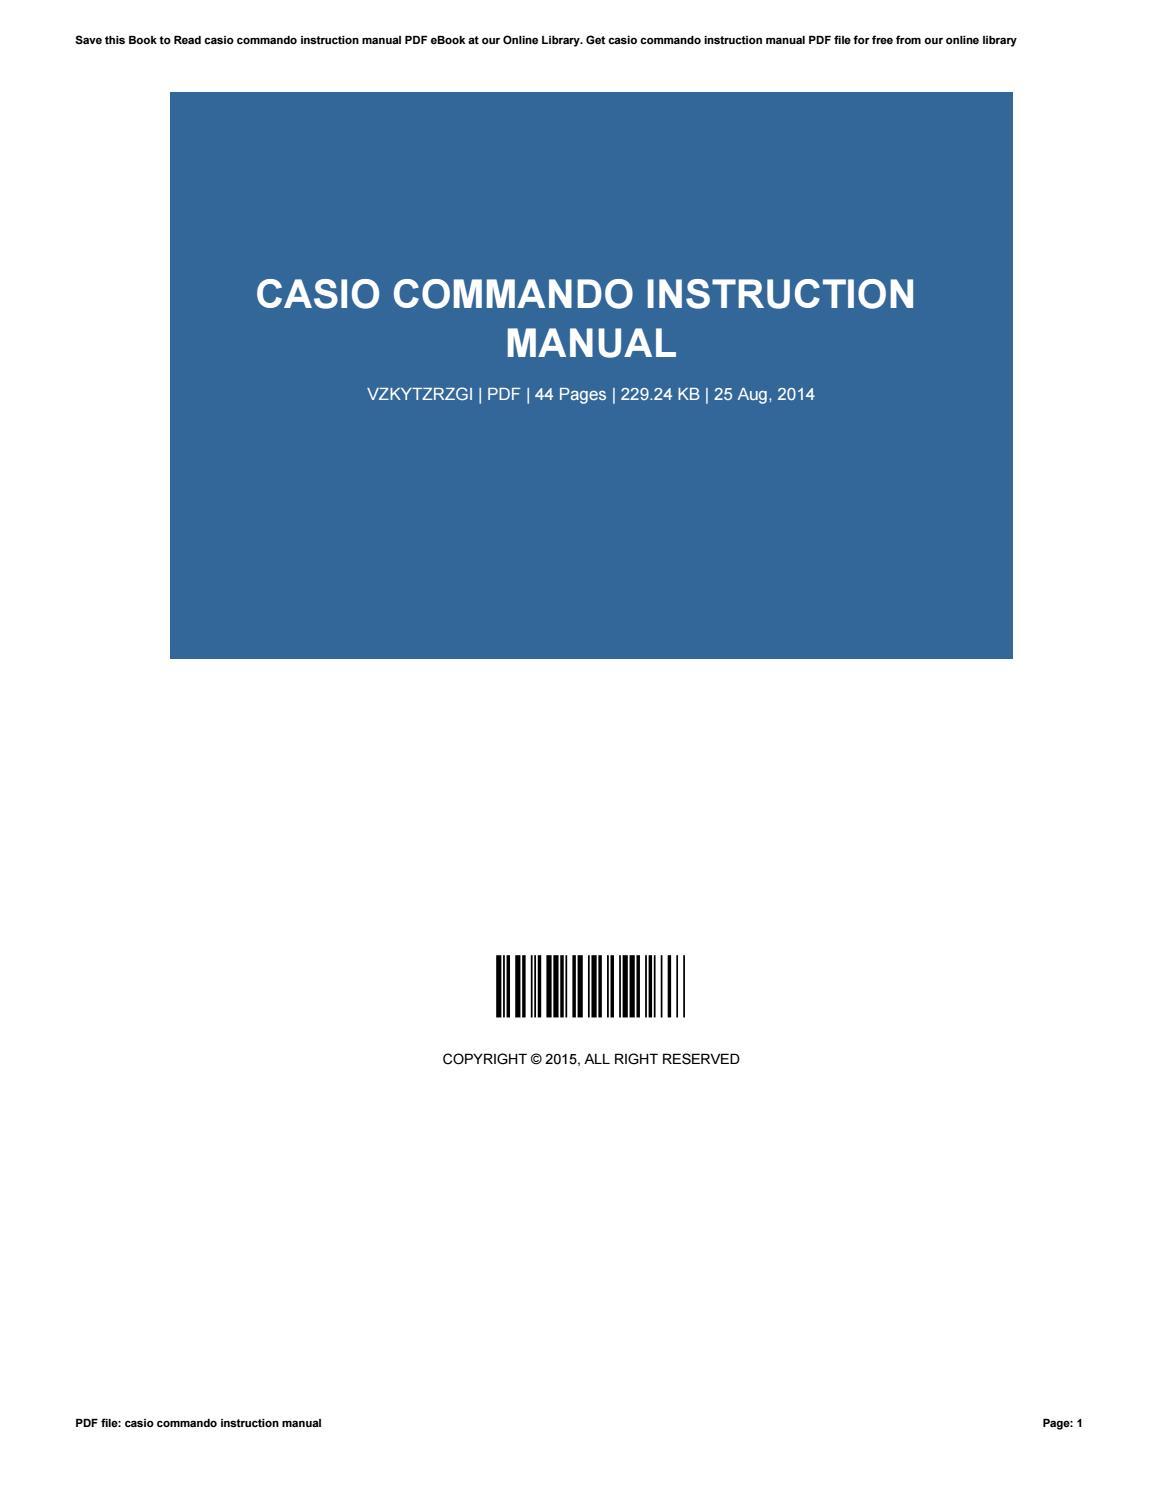 tomtom start 25 instruction manual rh aplacetonest com